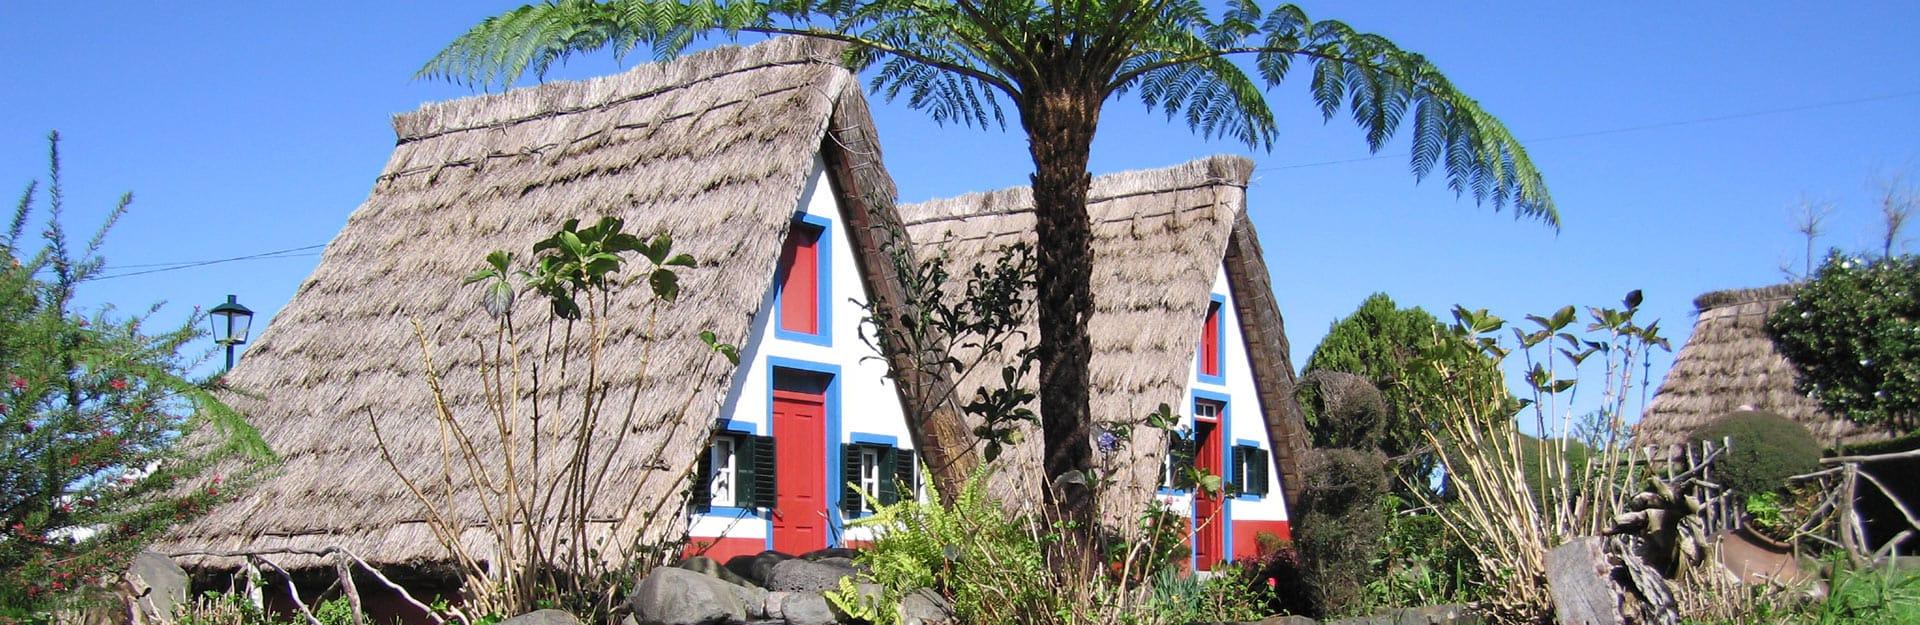 casas-santana-madeira-helloguide